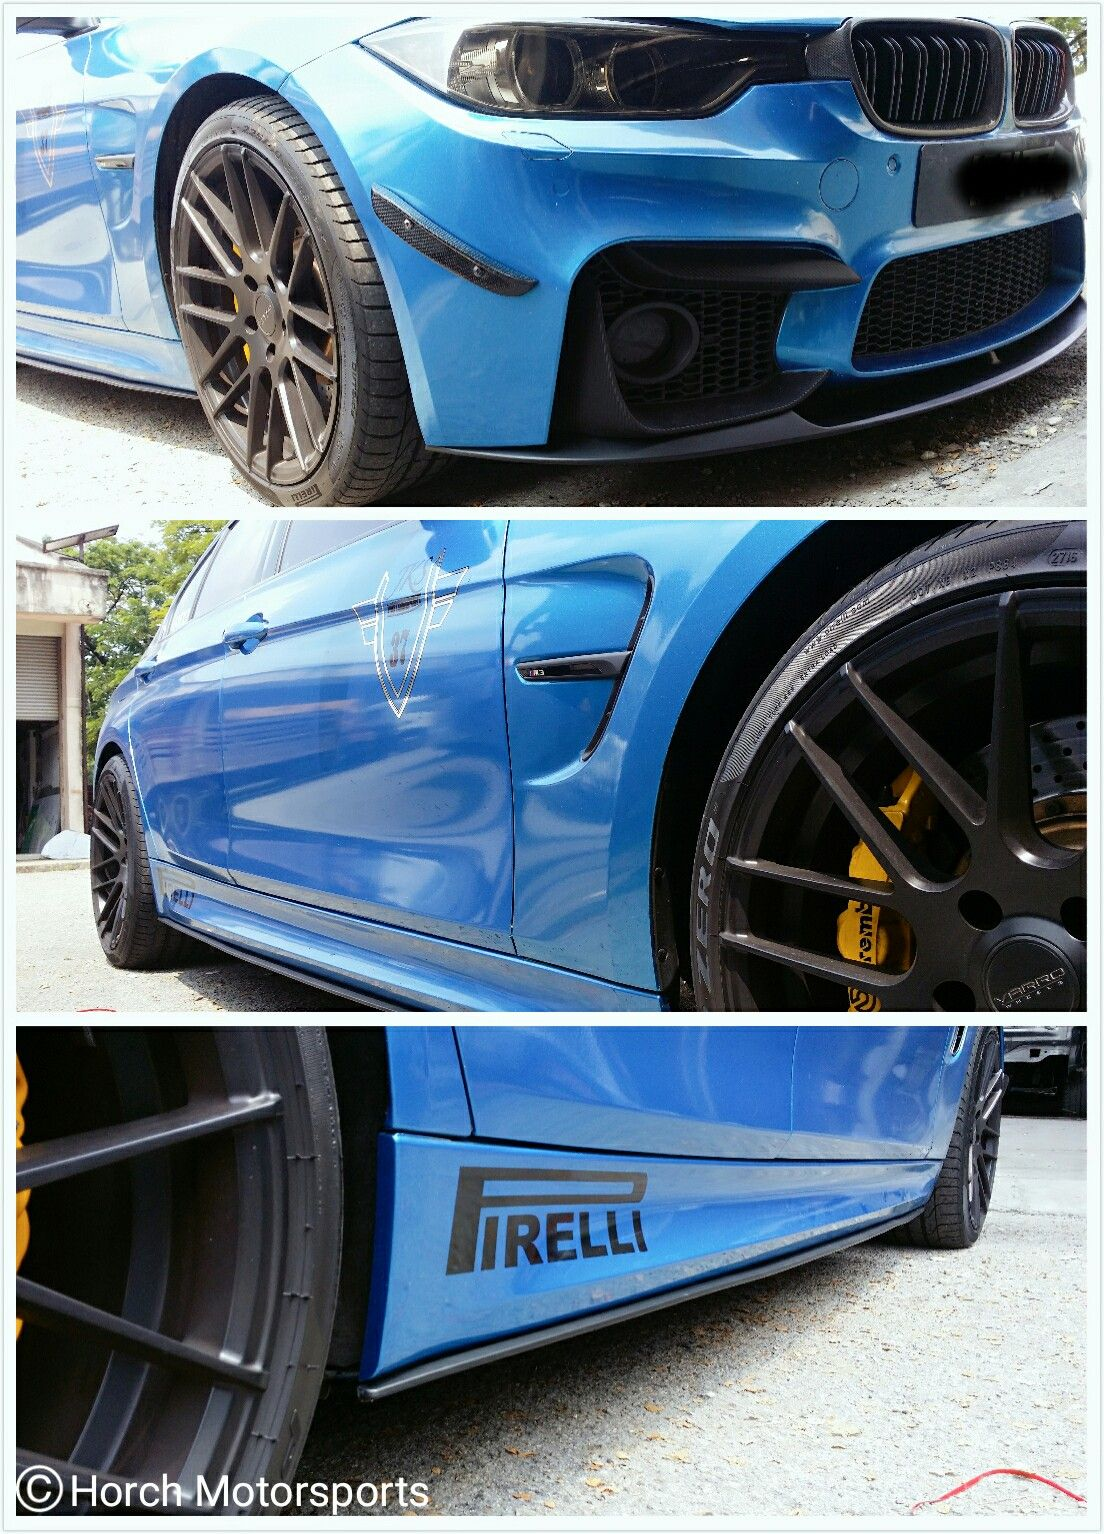 cb377367a15 F30 M3 Bumper × M-Performance M3 front Lip × Rocker Panel. FREE  installation & GST FREE @ Horch Motorsports 017-340 5316. #Bimmer #F30  #Bodykit #M3 # ...